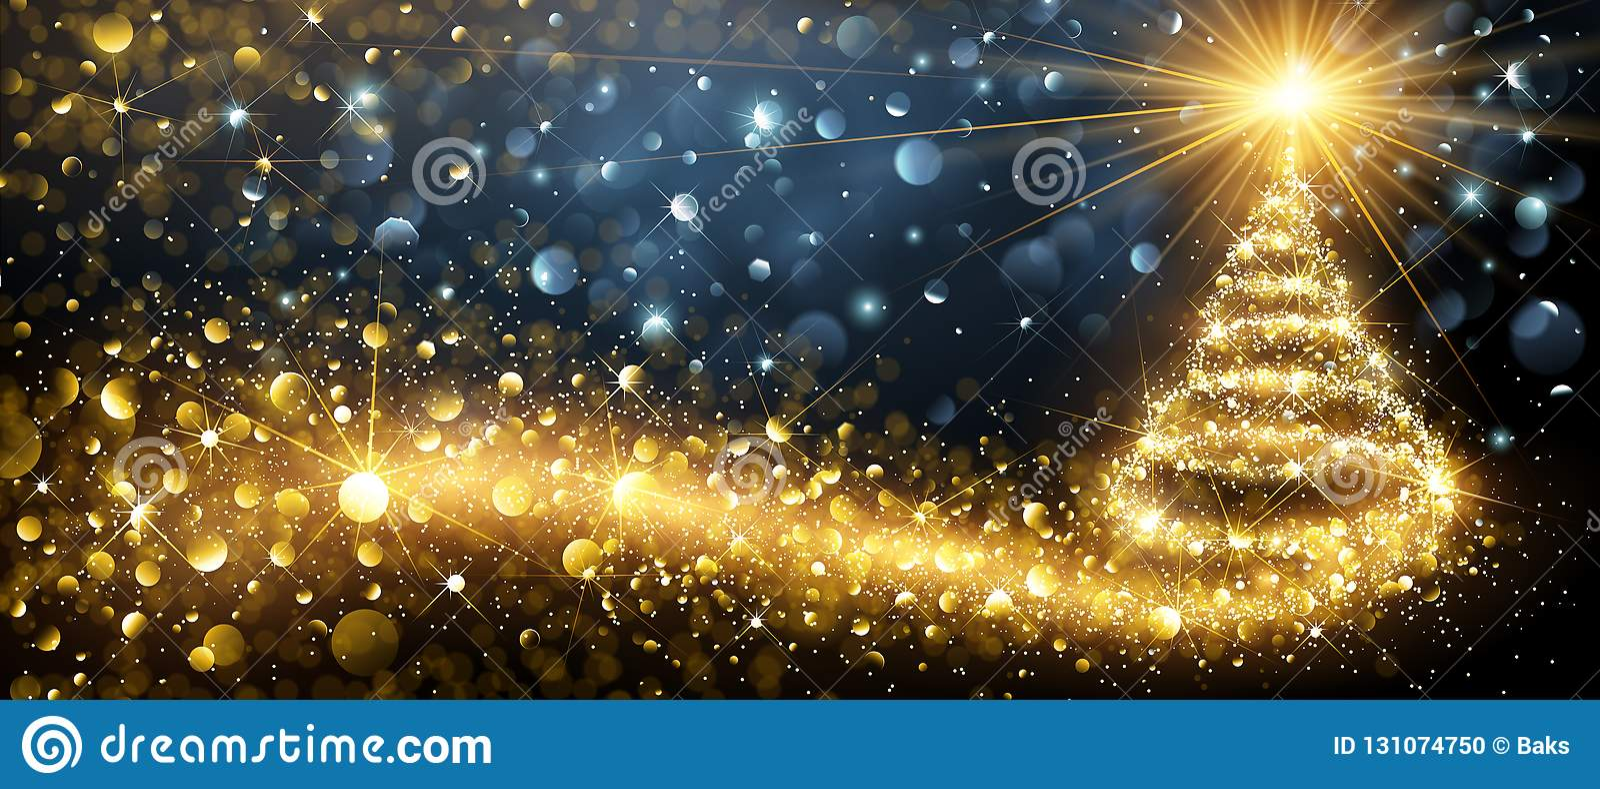 Golden Christmas Tree Vector Stock Vector Illustration Of Magic